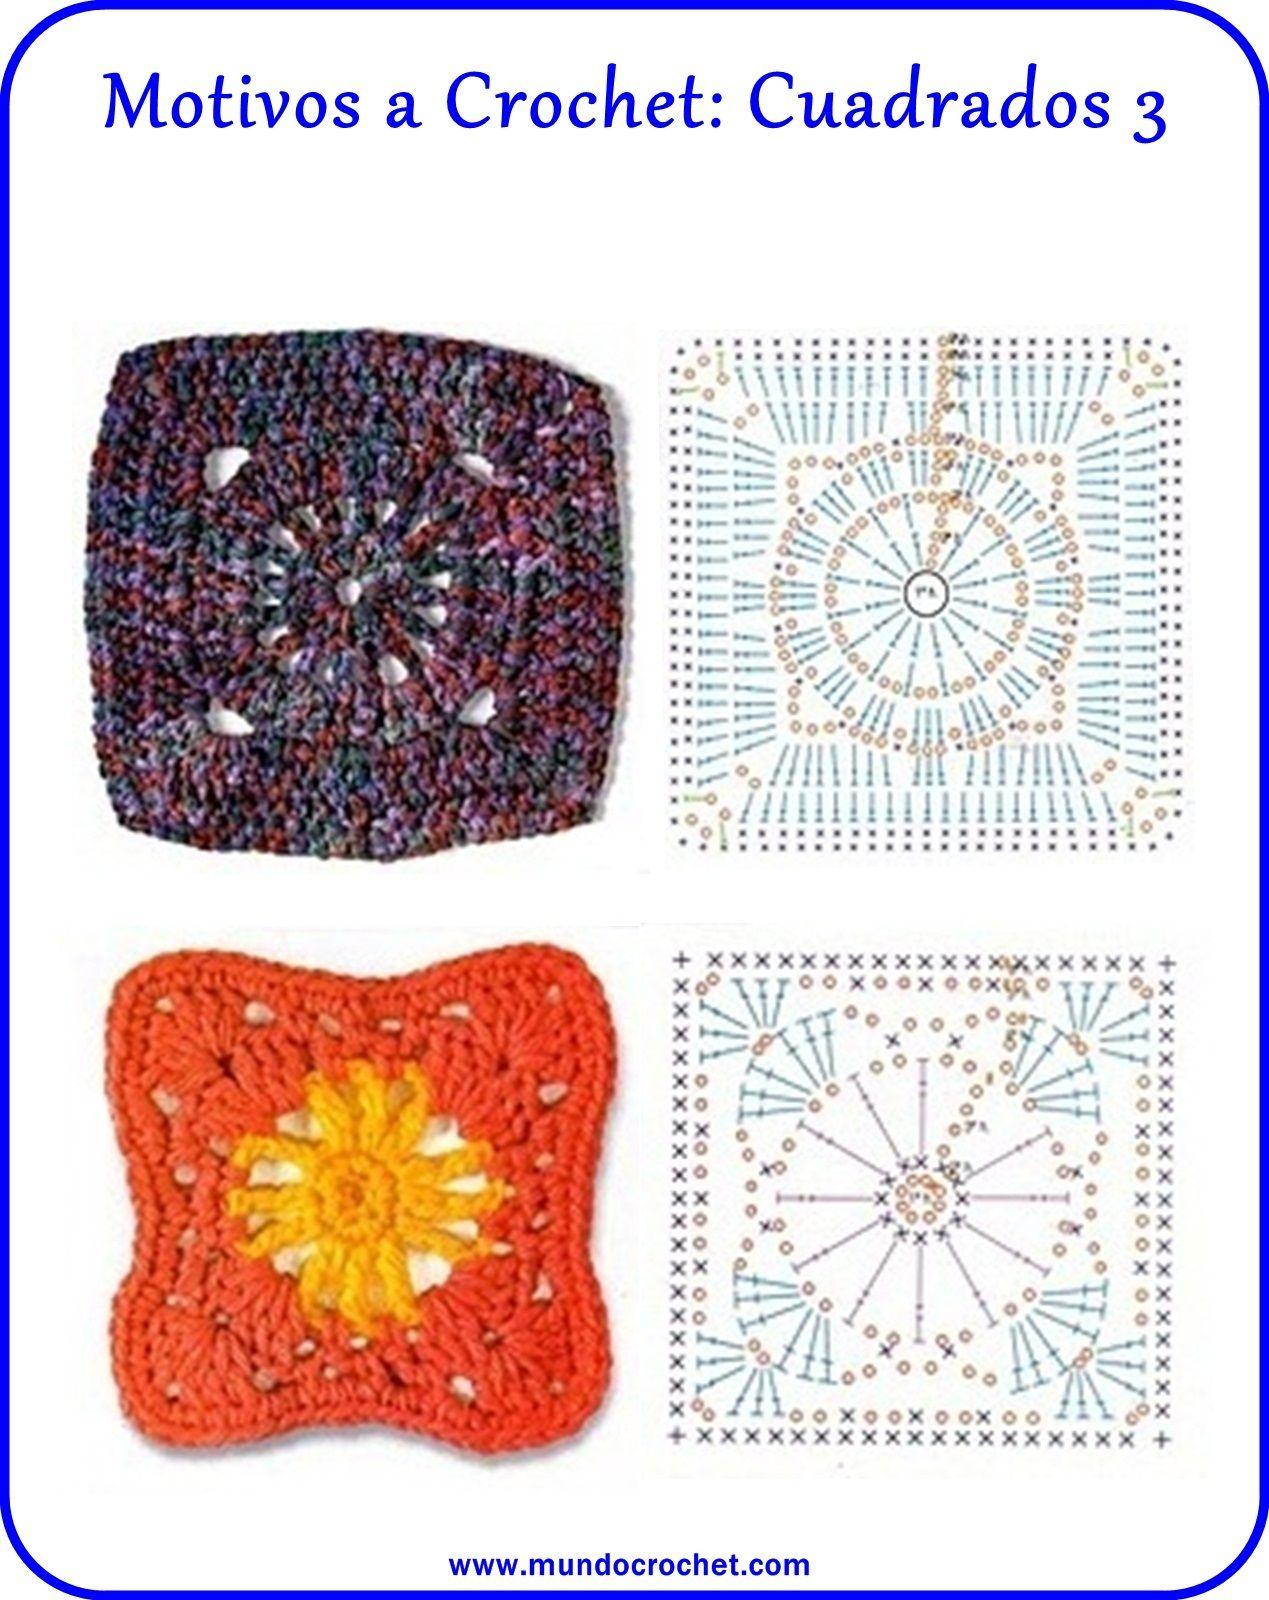 Motivos a crochet Archives - Mundo Crochet | Grannys | Pinterest ...